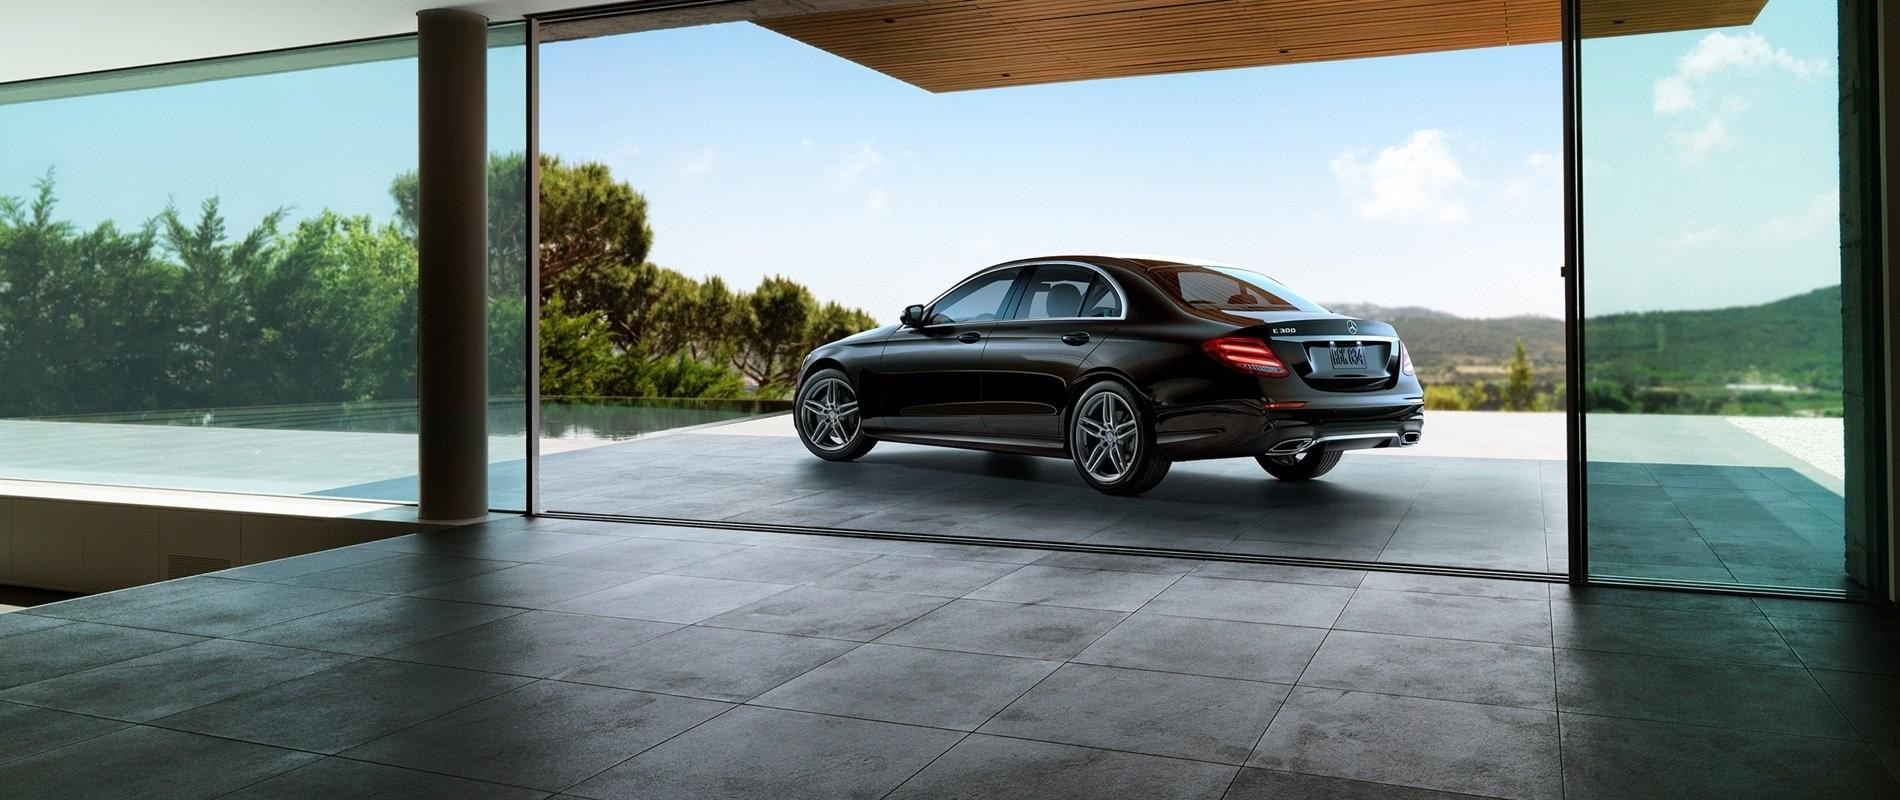 2018 Mercedes-Benz E300 4MATIC